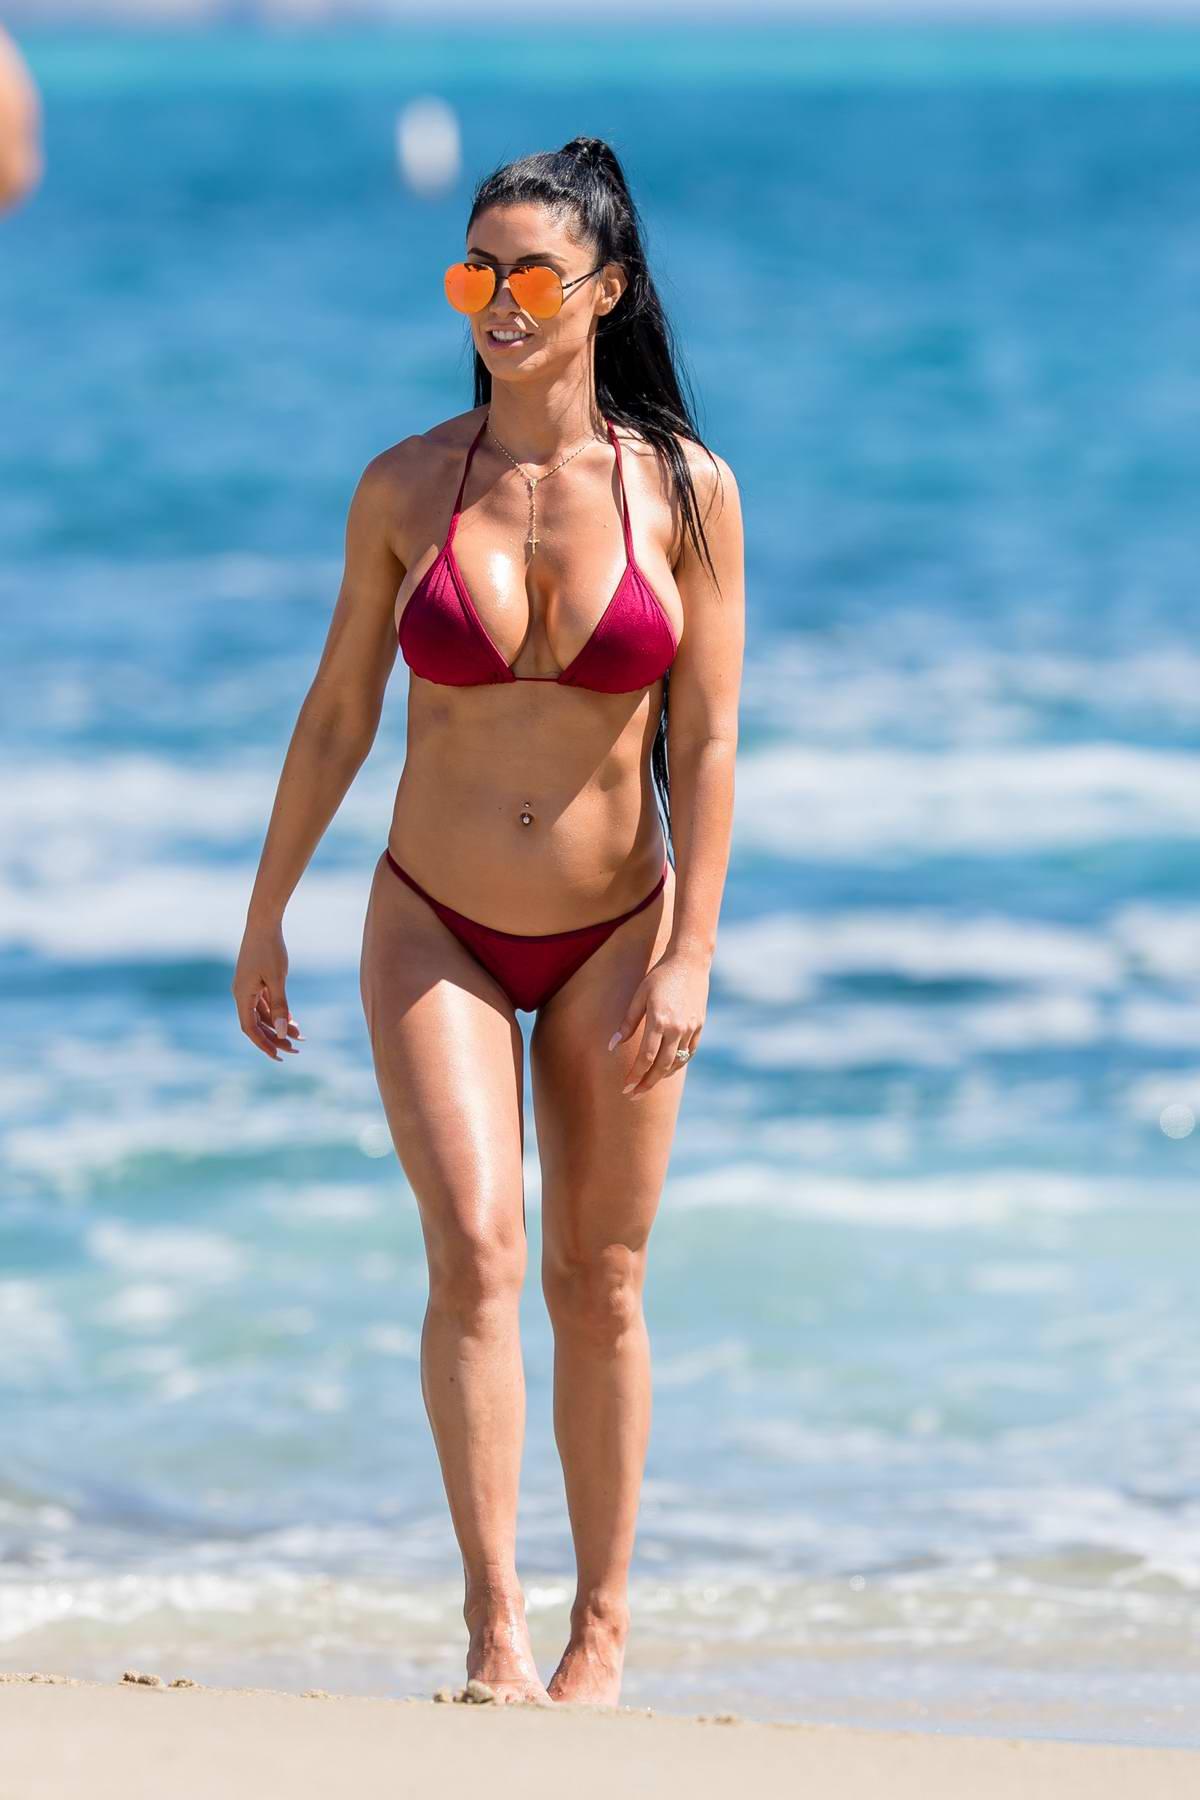 Natalie Eva Marie in bikini on a NEM Fashion shoot on Laguna beach in Los Angeles